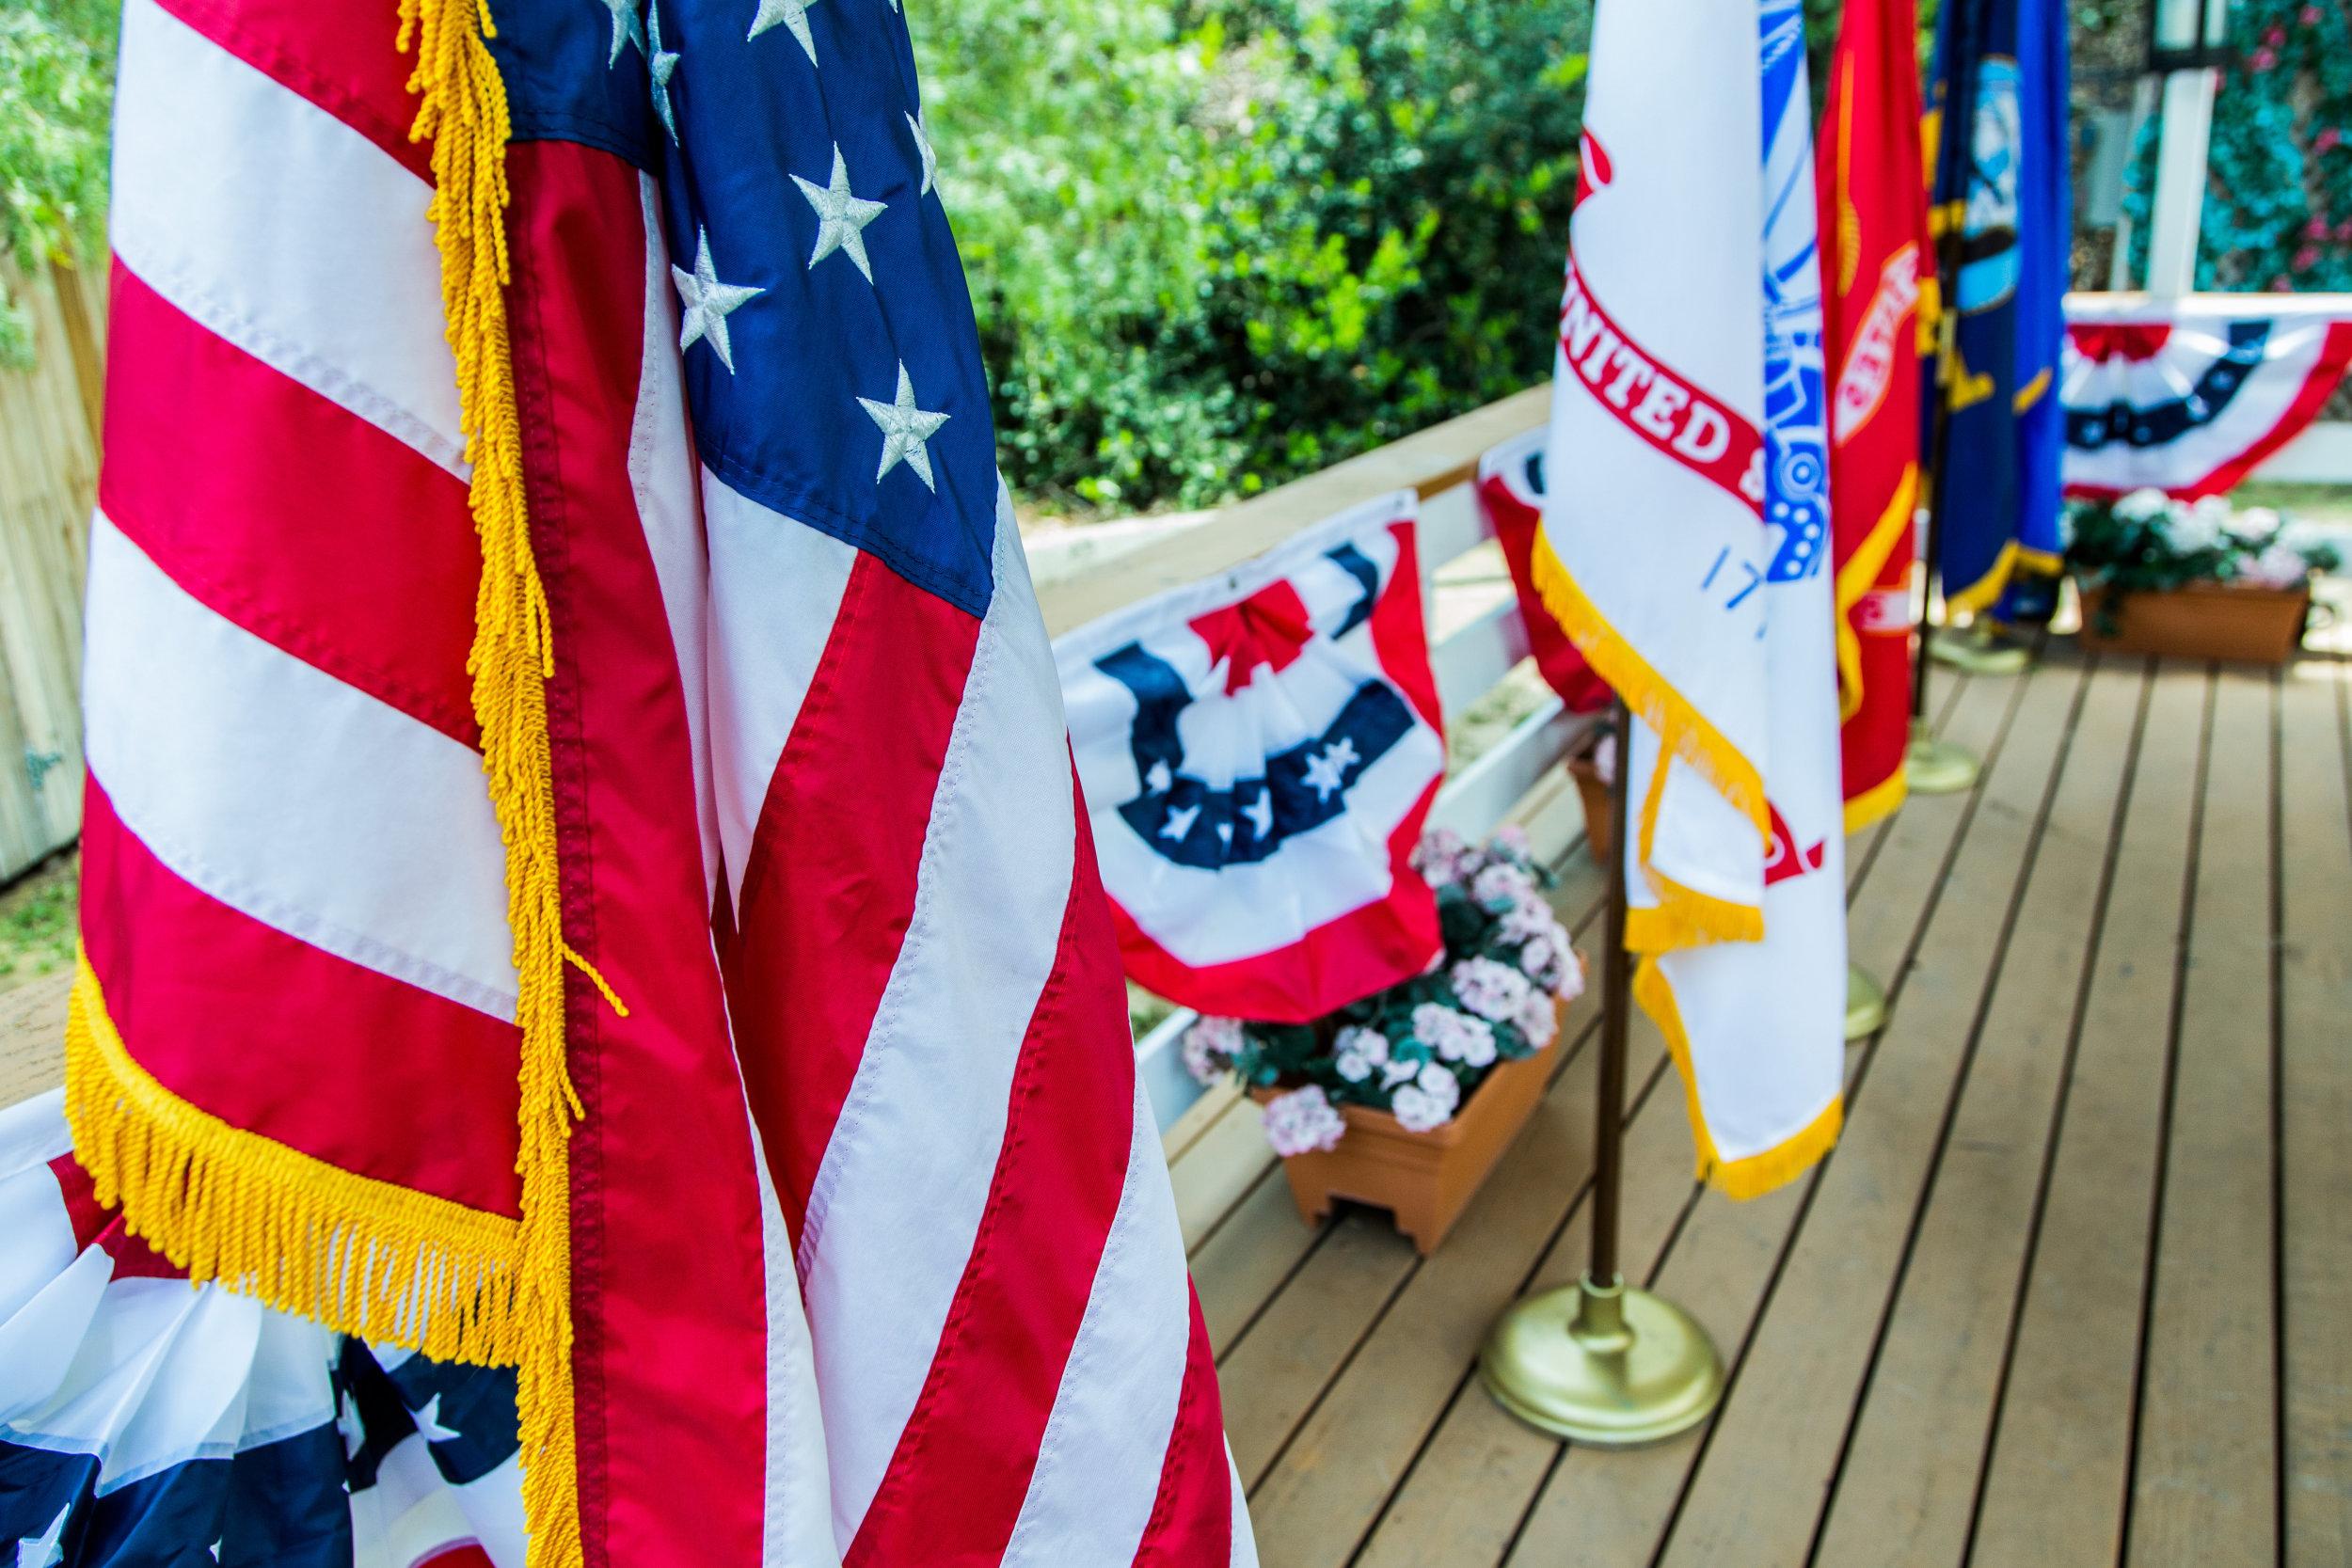 How to flag folding etiquette home family hallmark for Flag etiquette at home